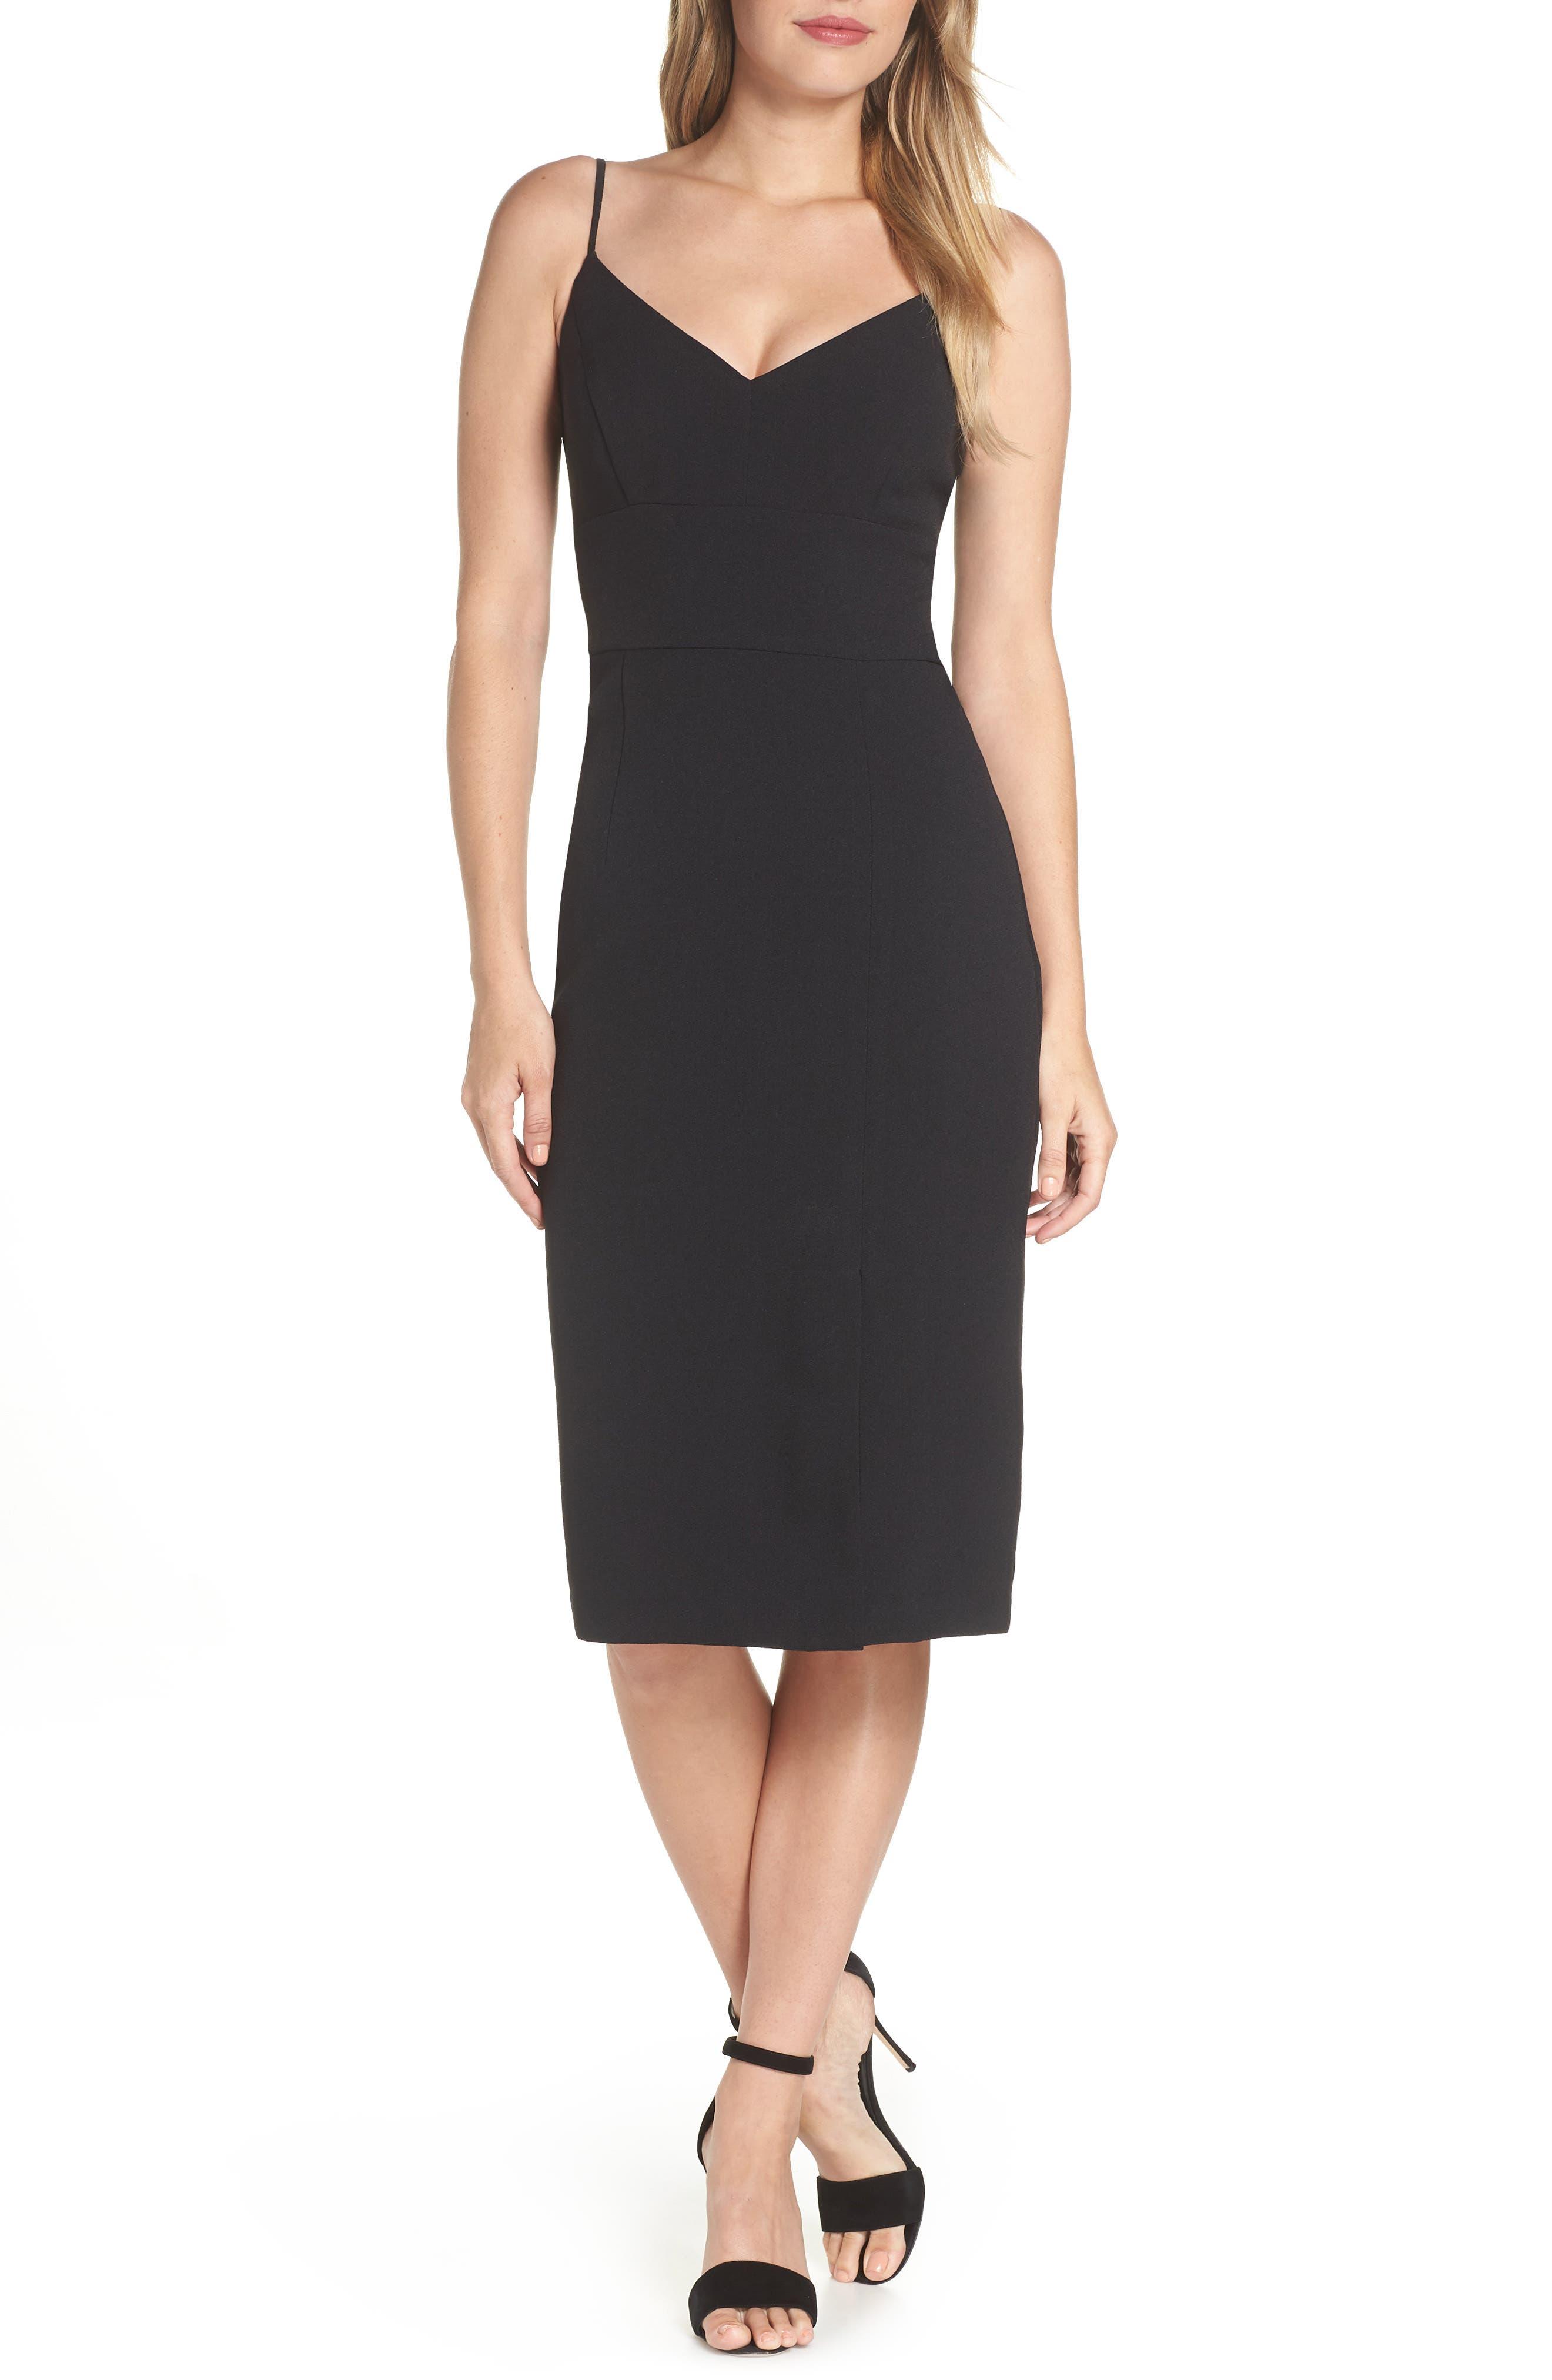 Eliza J Sleeveless Cocktail Dress